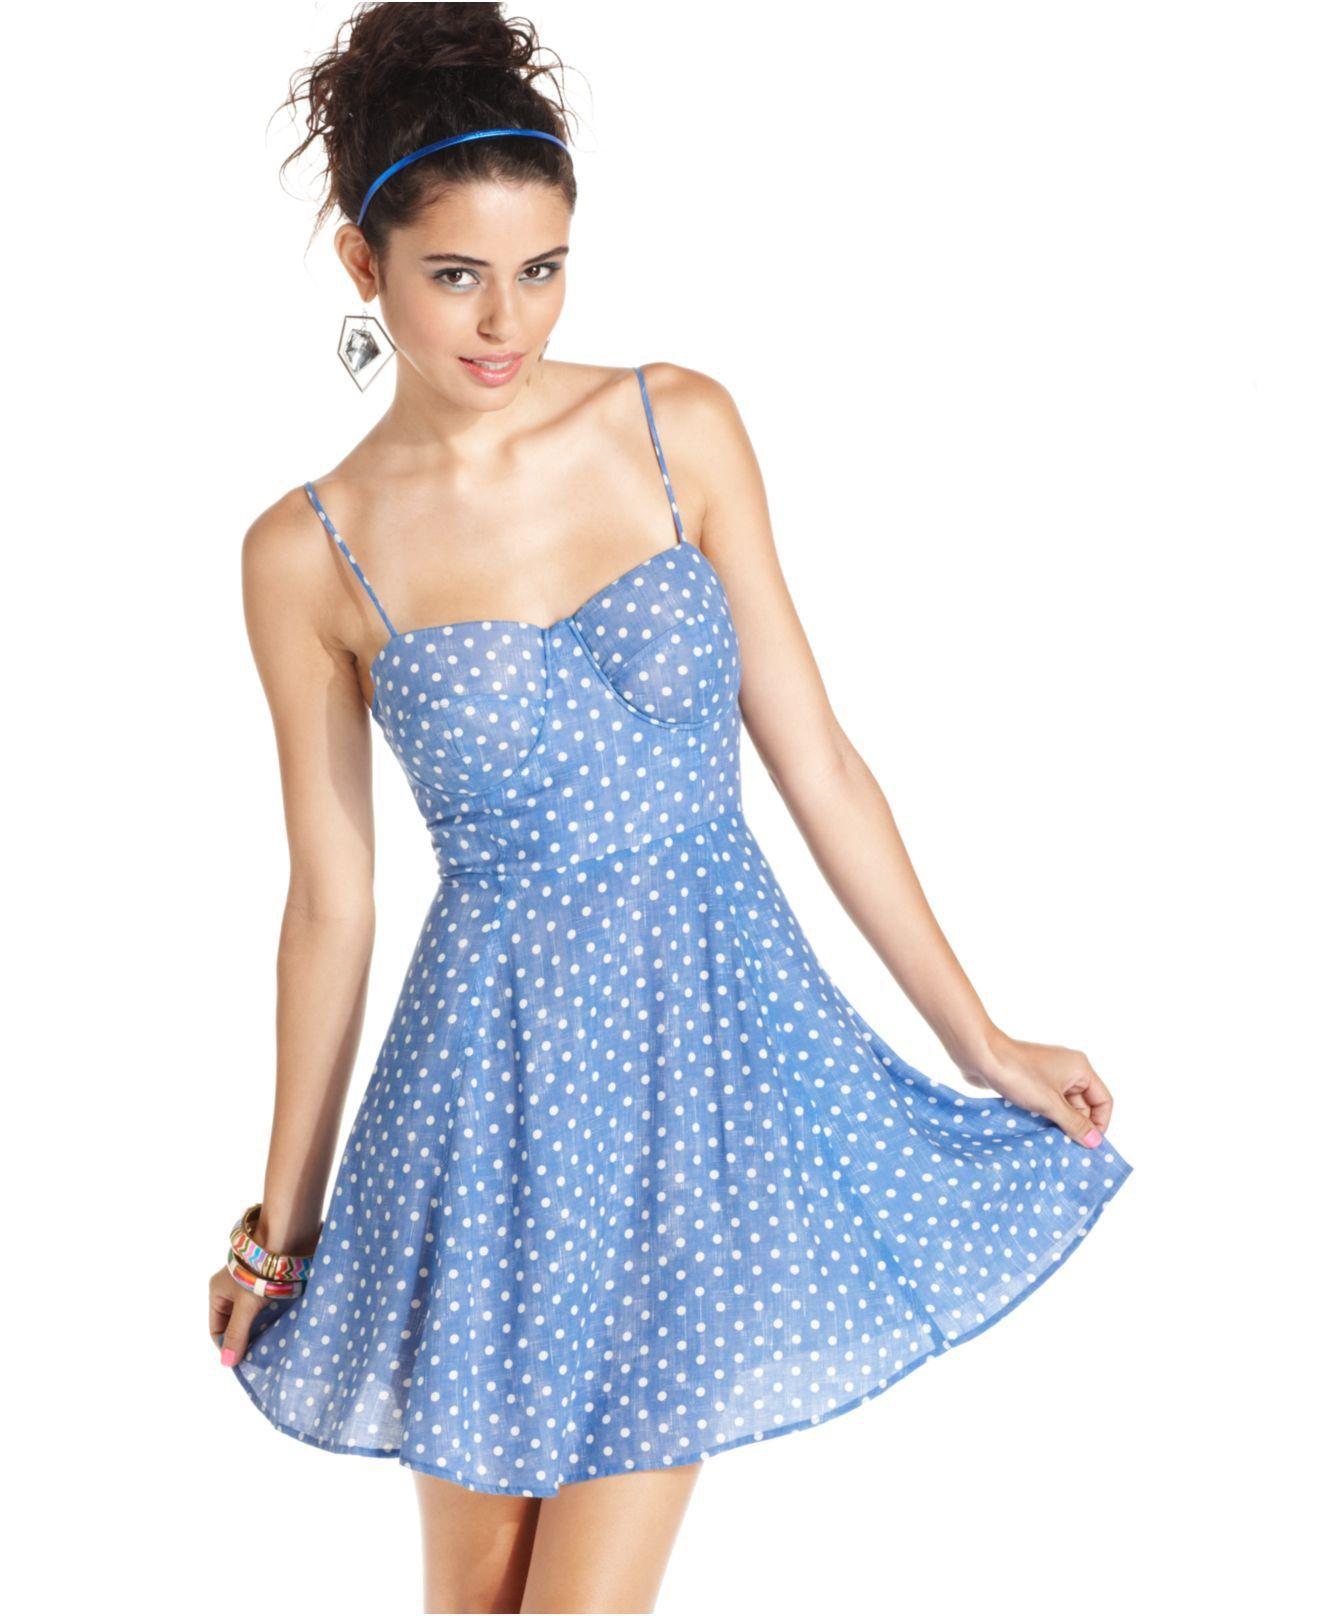 Images of Summer Dresses For Juniors - Reikian